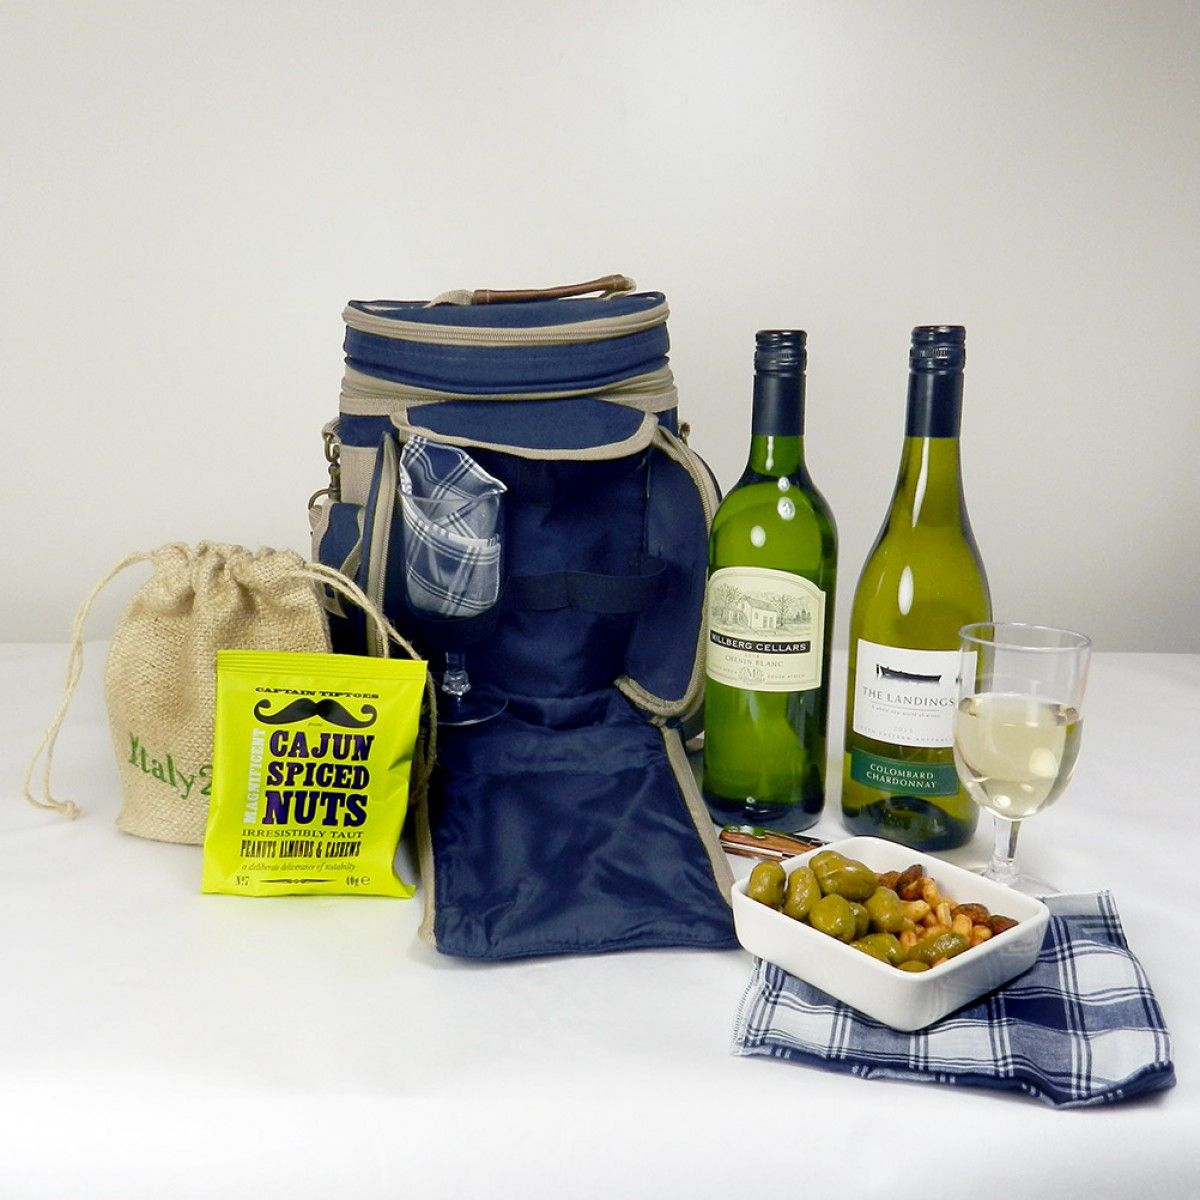 sundowner picnic cool bag gift £ from hay hampers  picnic  - sundowner picnic cool bag gift £ from hay hampers